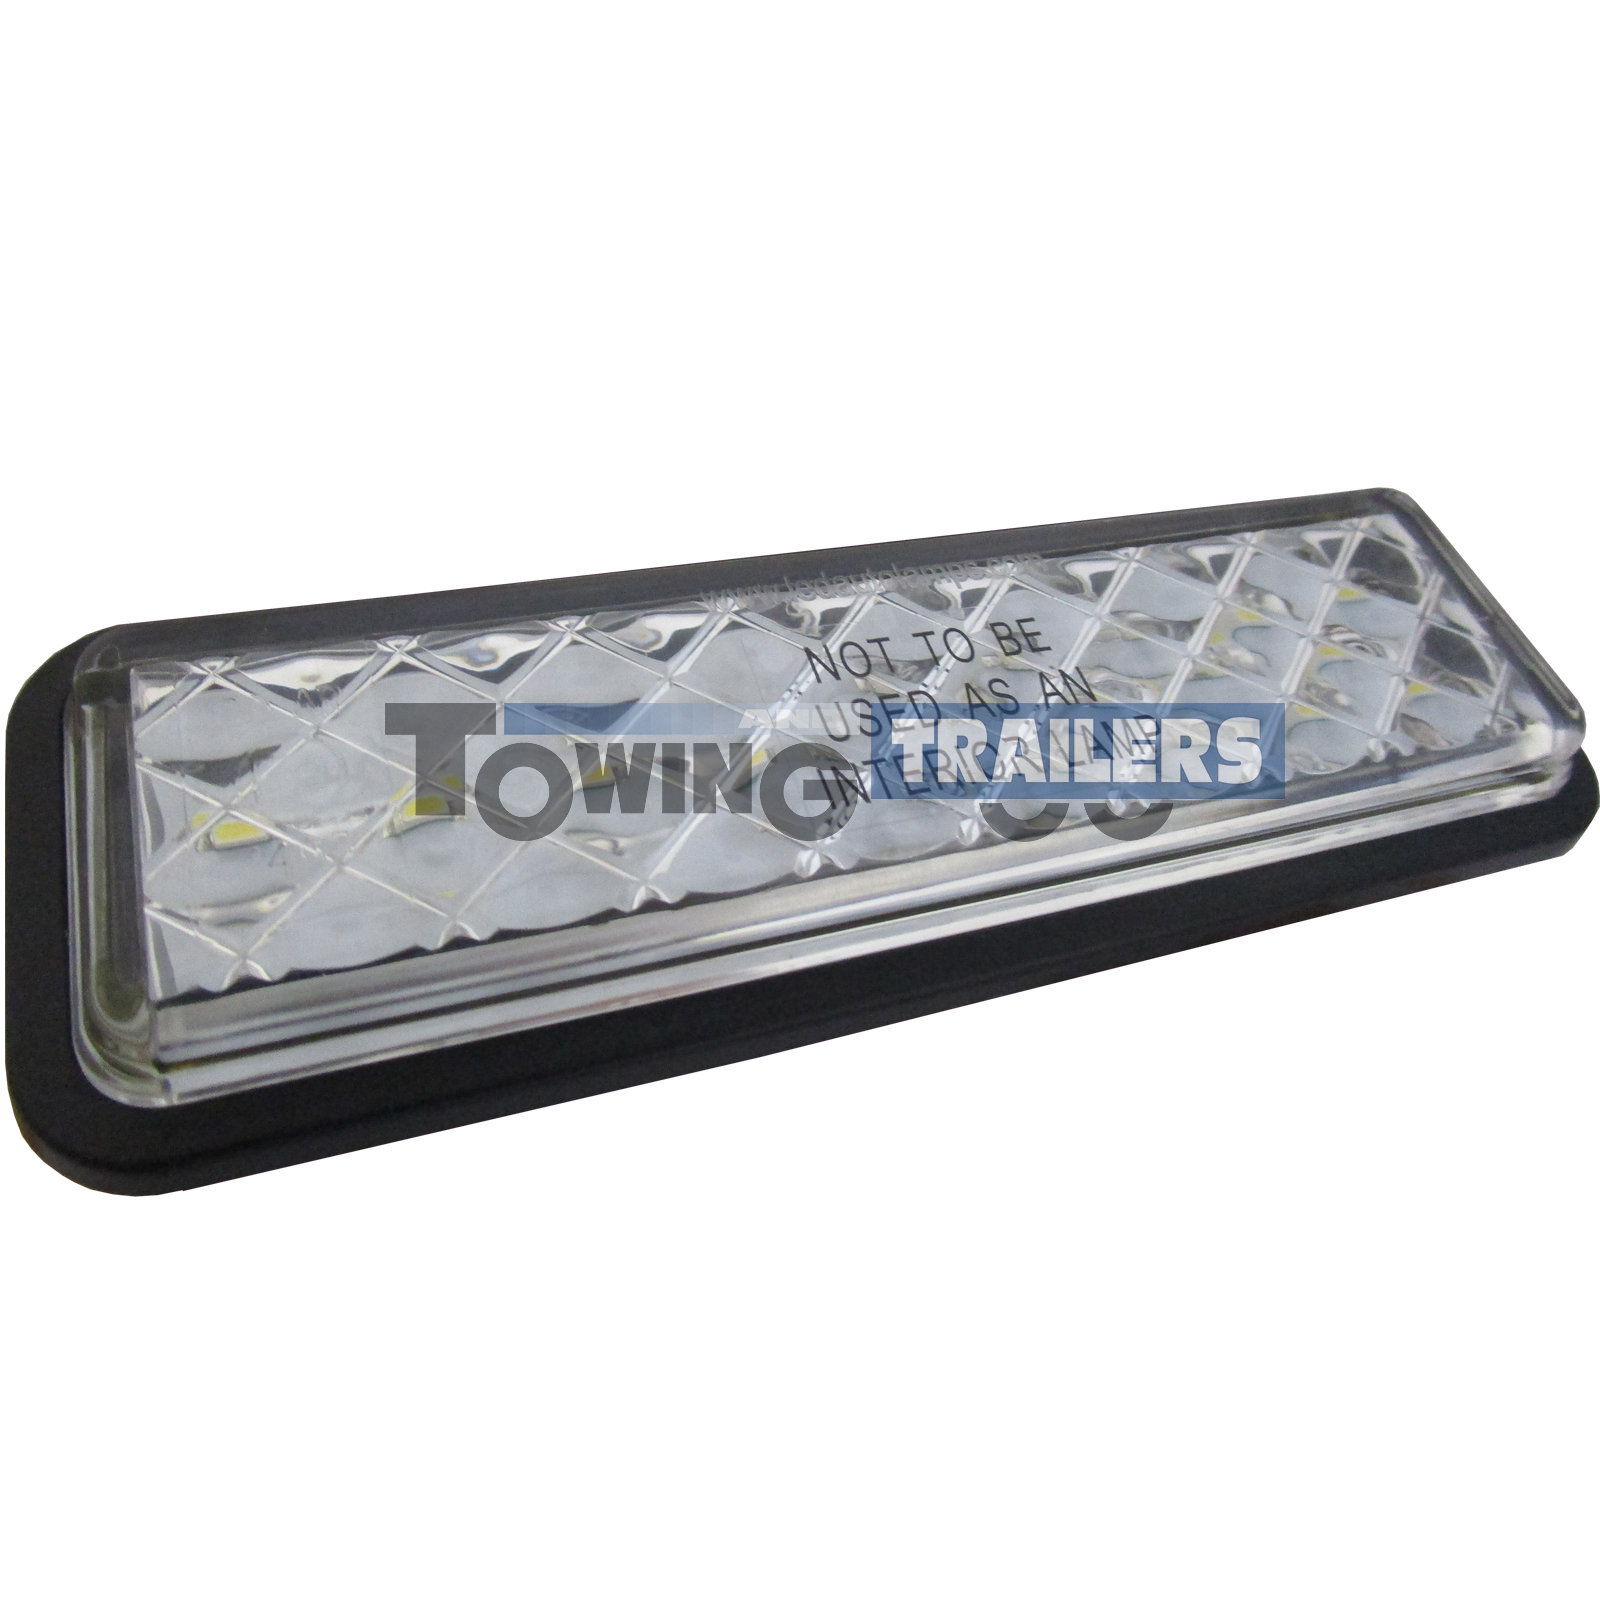 LED Autolamps 135WMGE Reverse Light Grommet Mount